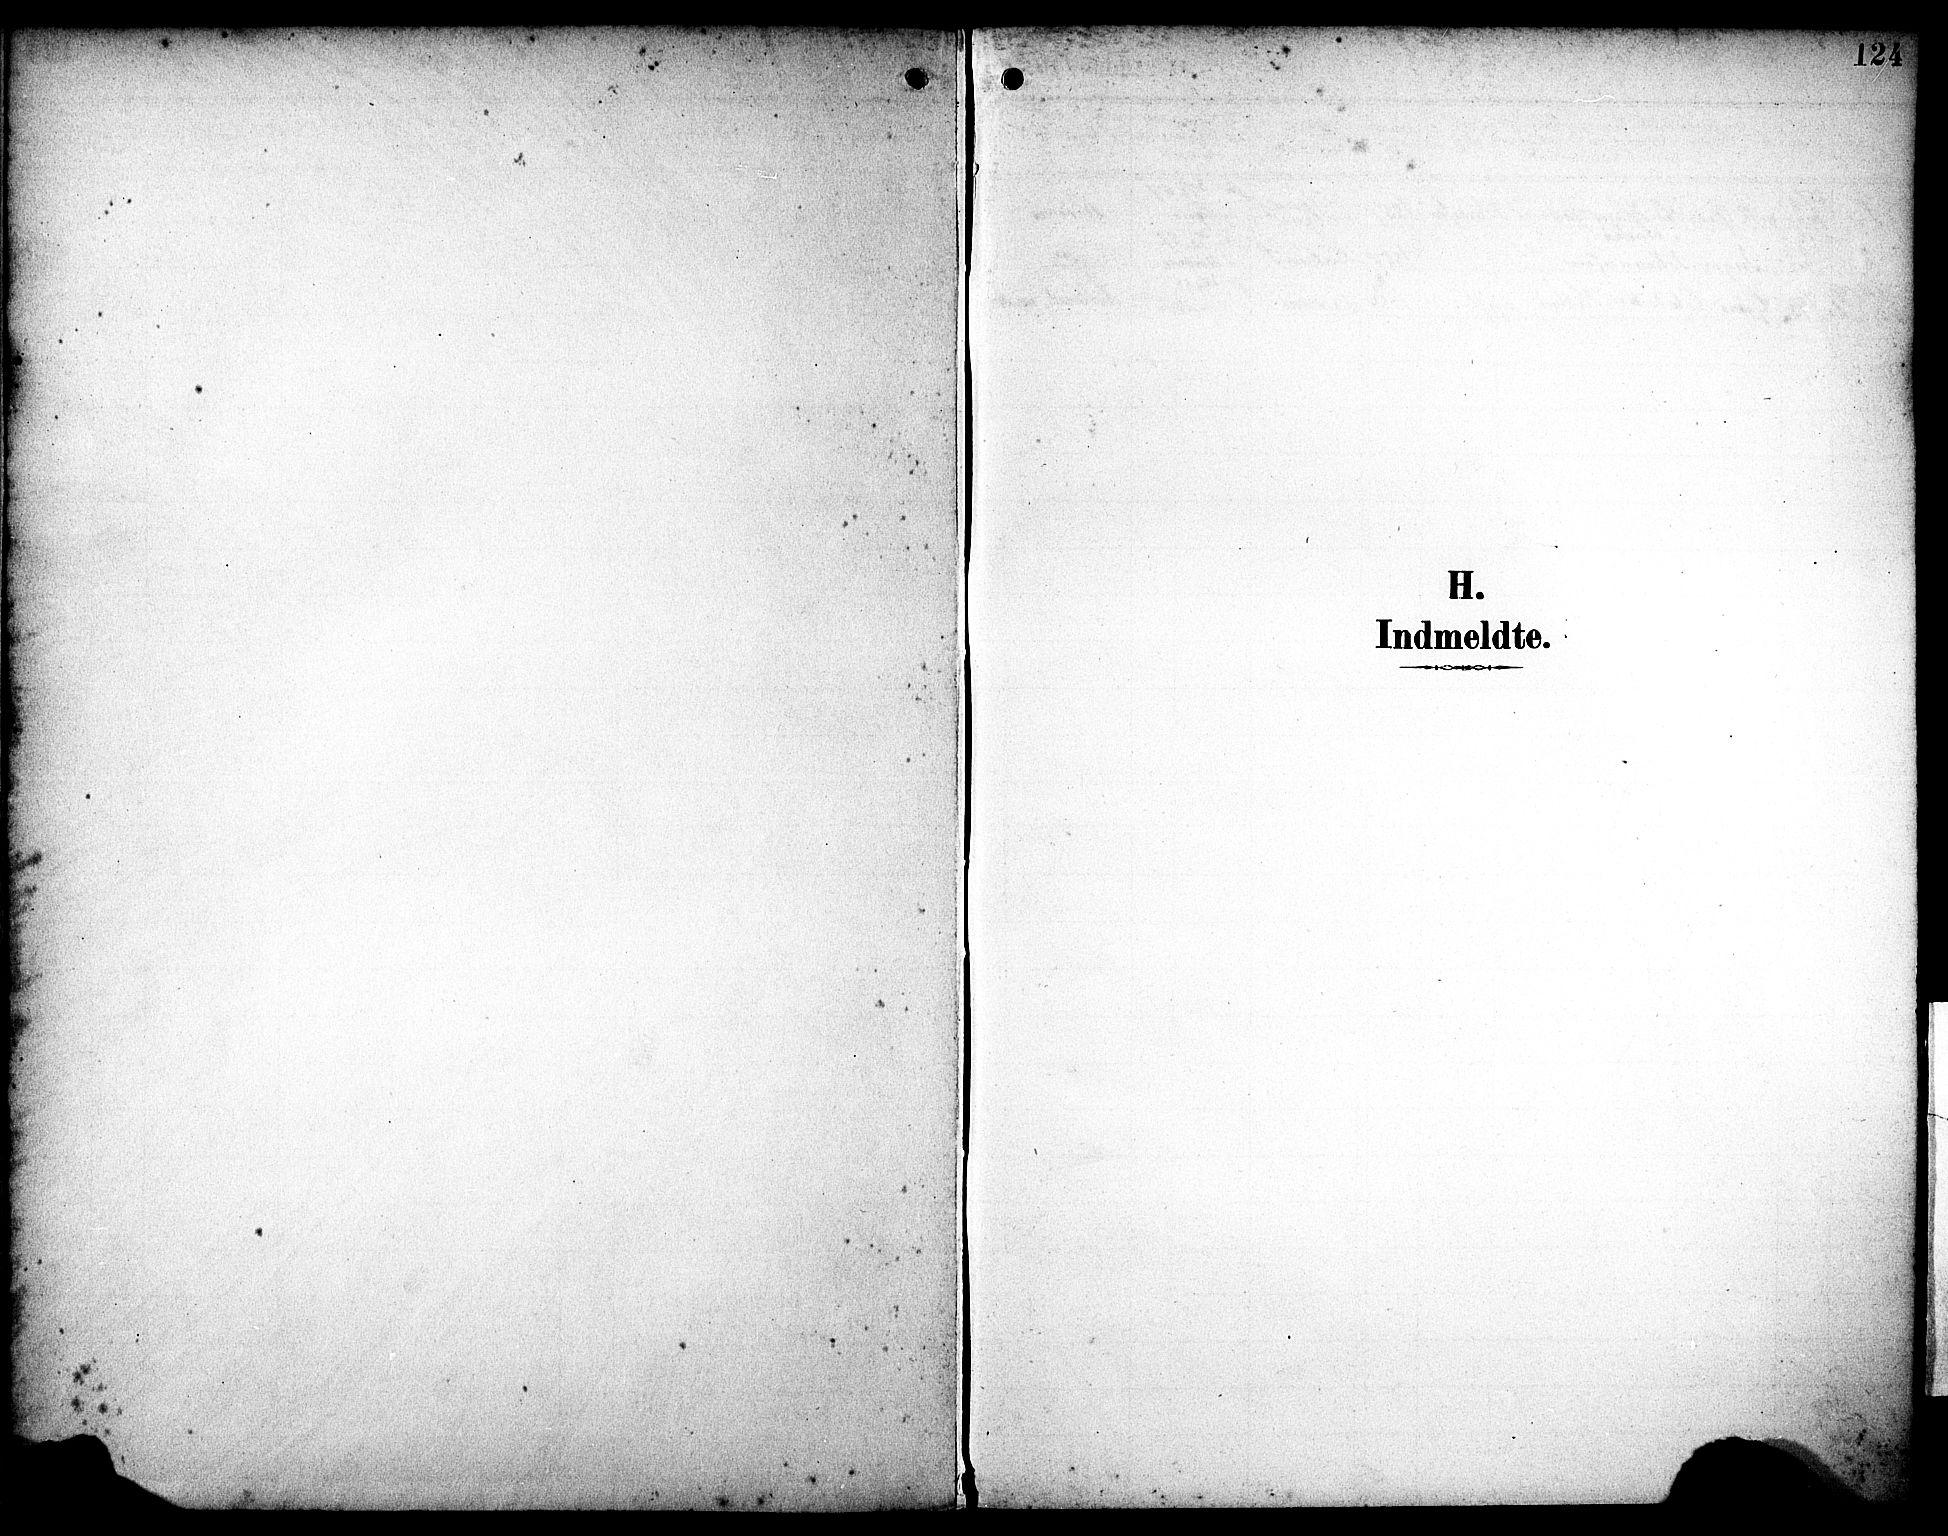 SAST, Egersund sokneprestkontor, Ministerialbok nr. A 19, 1893-1910, s. 124